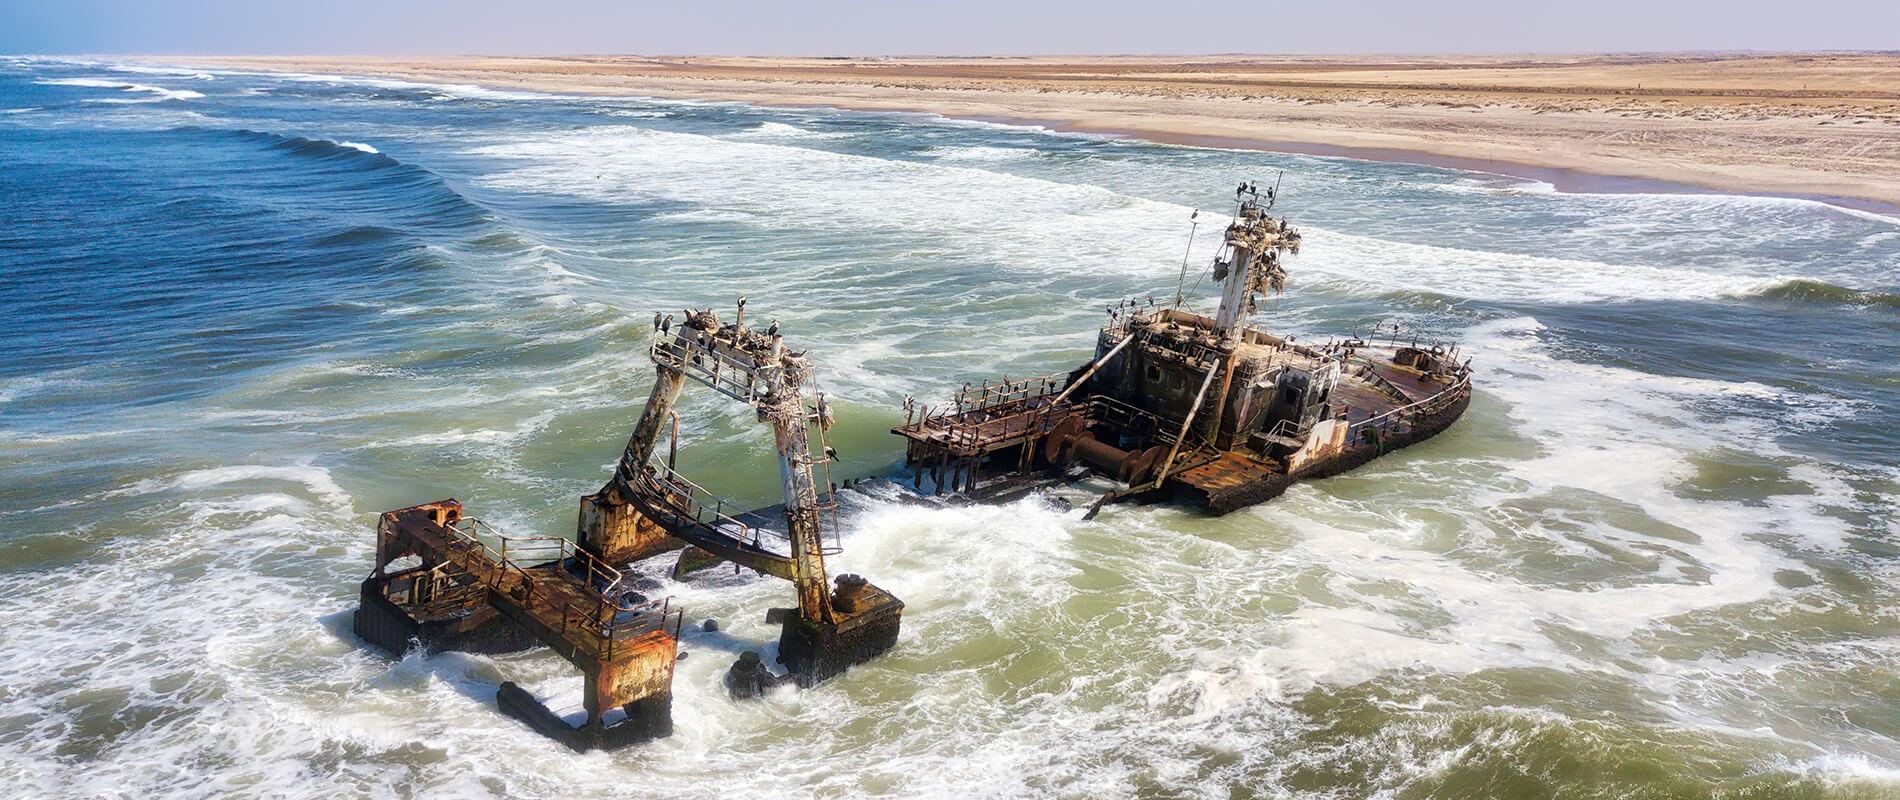 The Skeleton Coast, the most hostile coastal stretch of Namibia